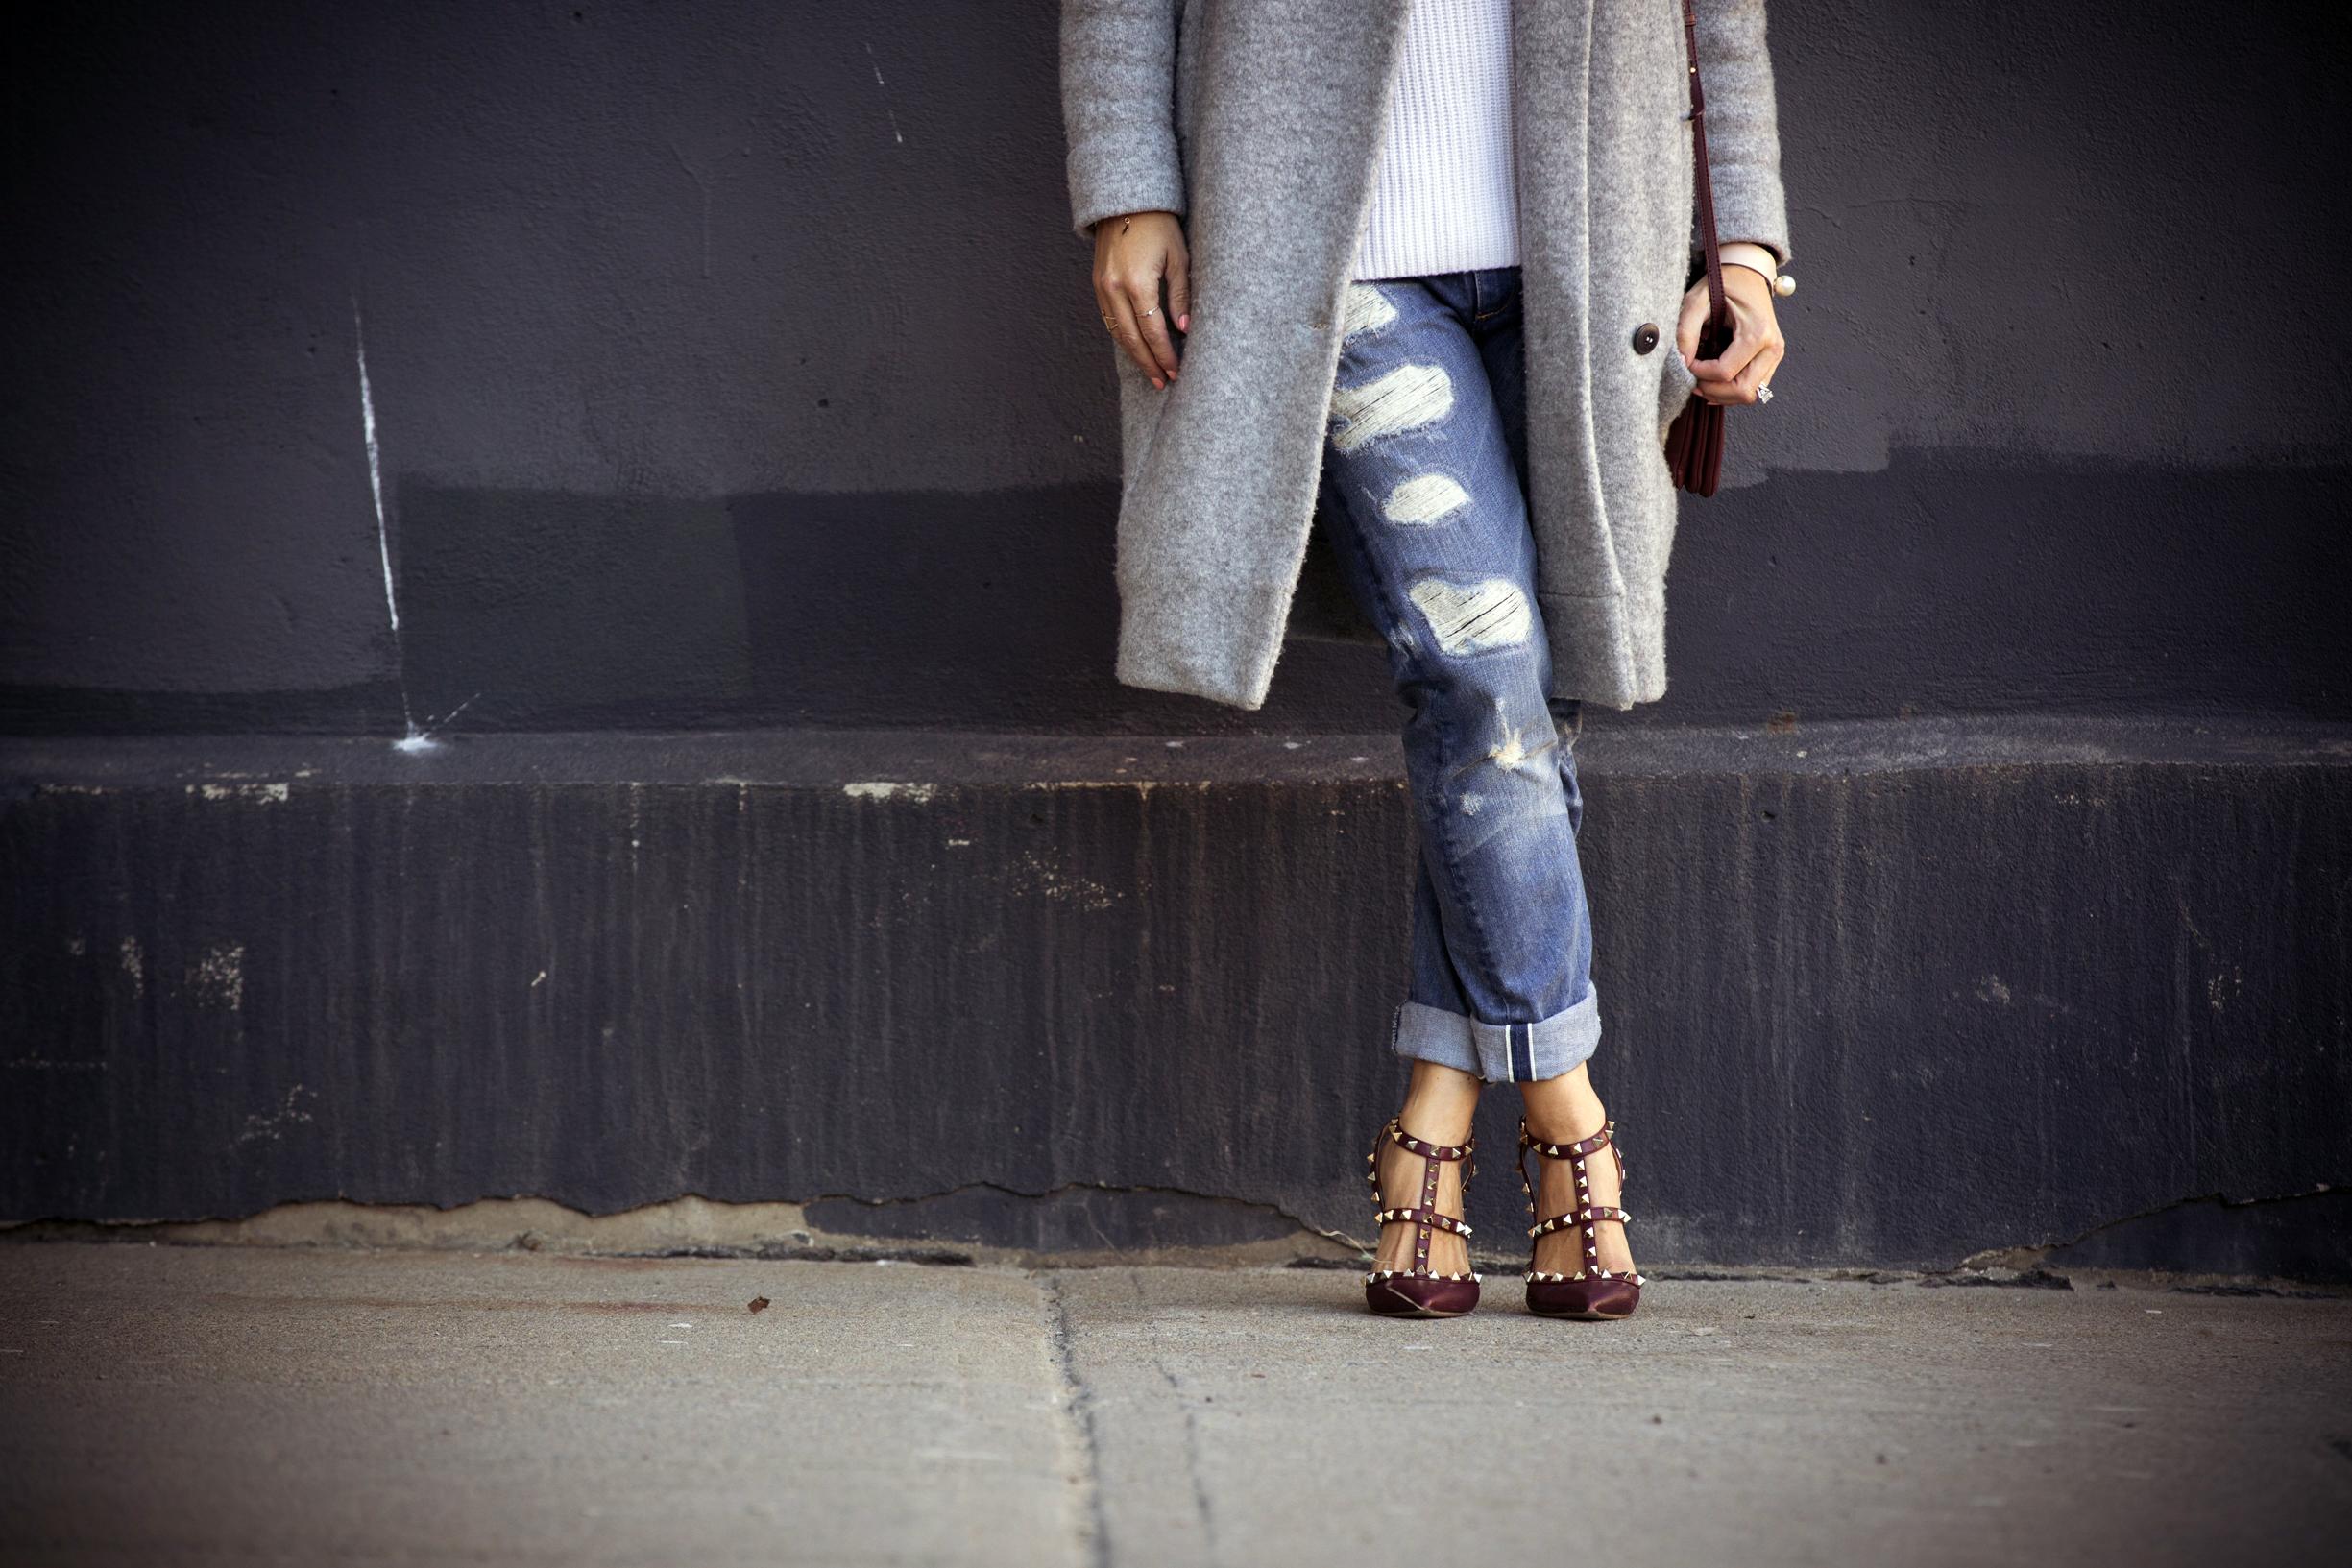 tortoise jeans tnt fashion rockstuds valentino shoes mlle jules fashion blogger mademoiselle jules soyer coat